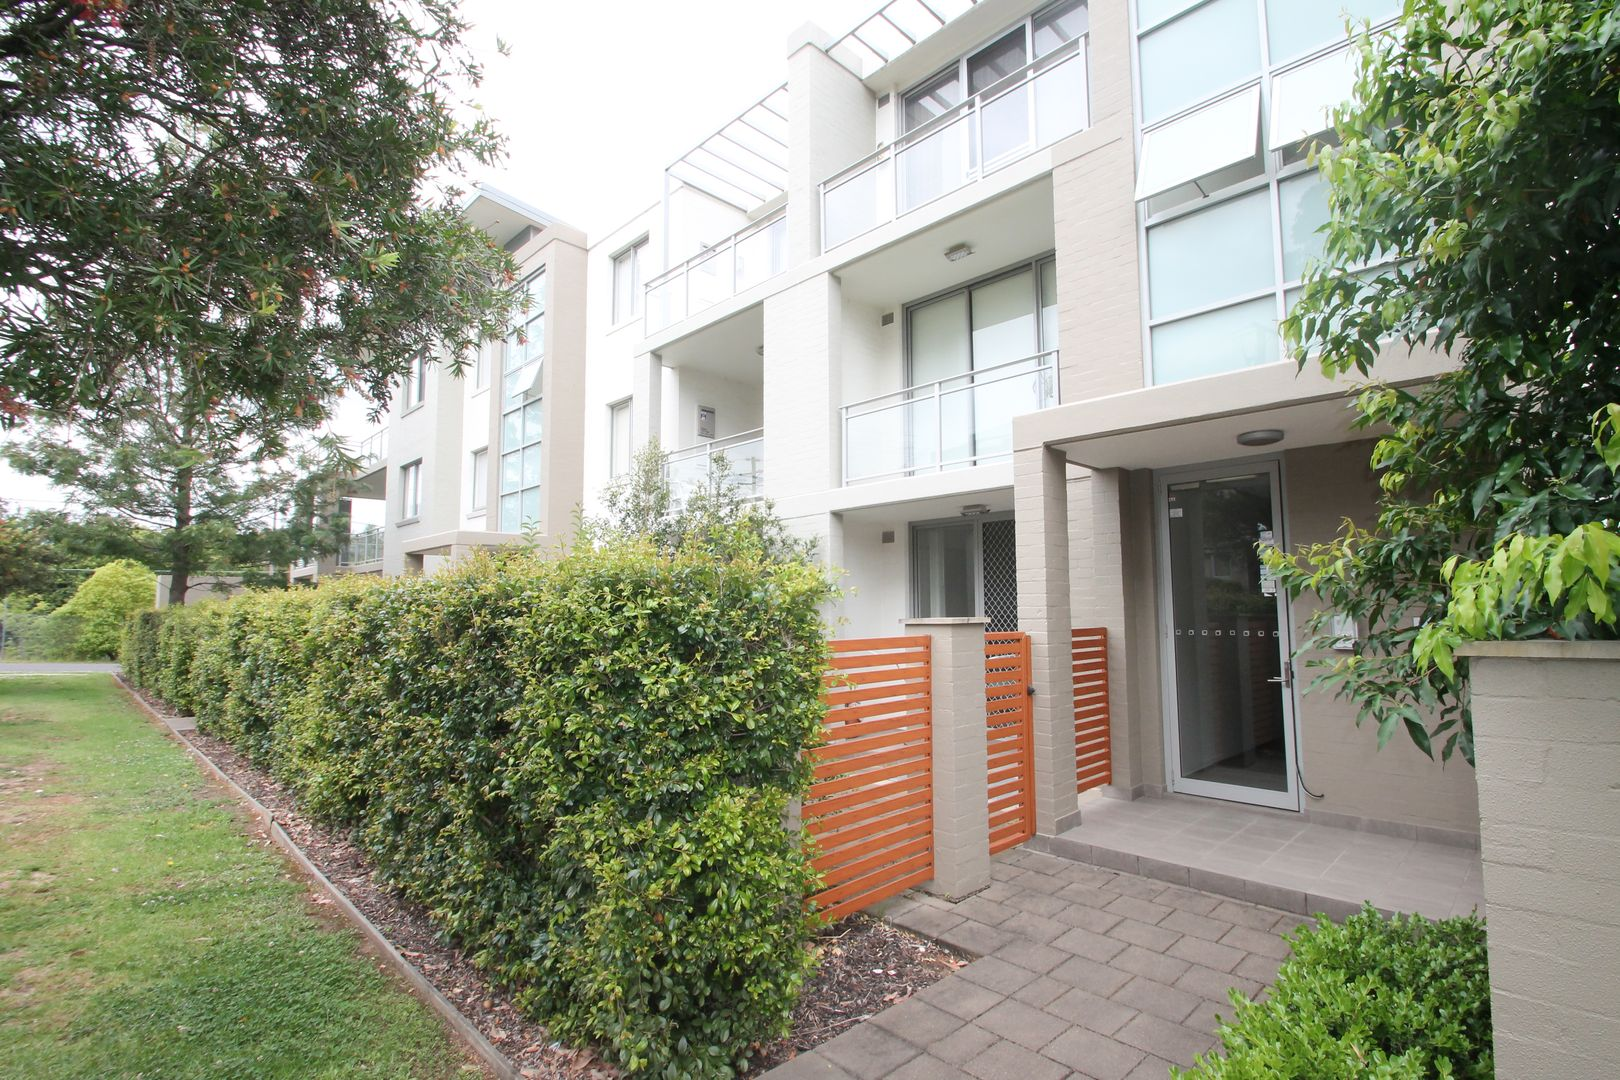 22/1-11 Lydbrook Street, Westmead NSW 2145, Image 0